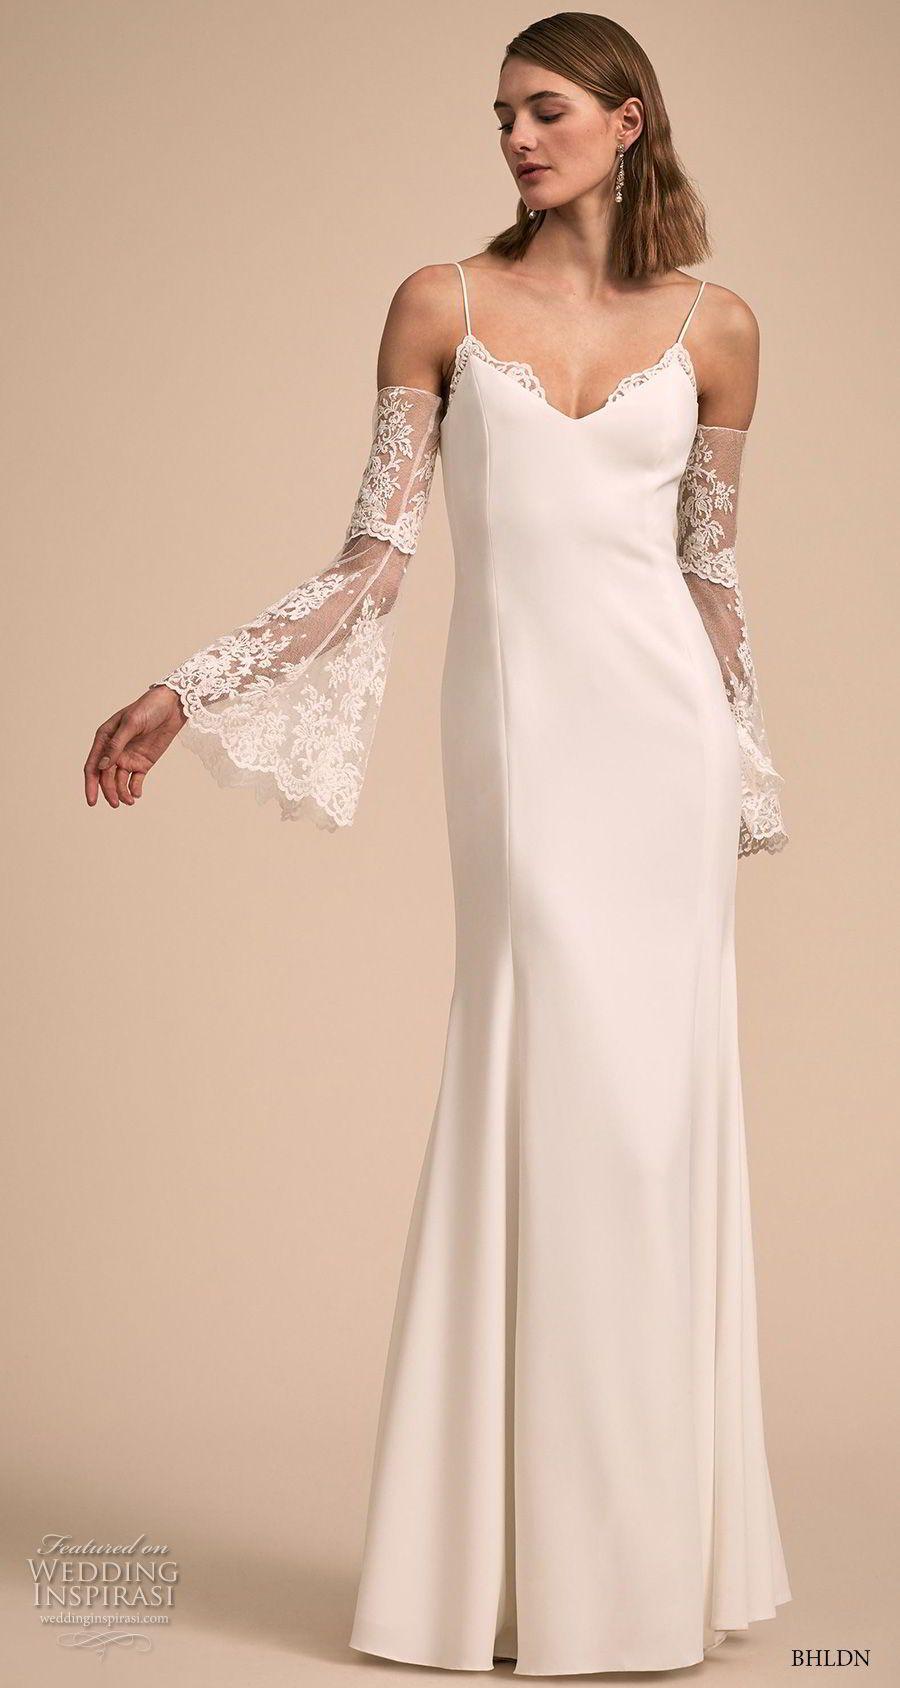 Simple elegant wedding dress designers  BHLDNus Designer Collective Exclusive Wedding Dresses u from the